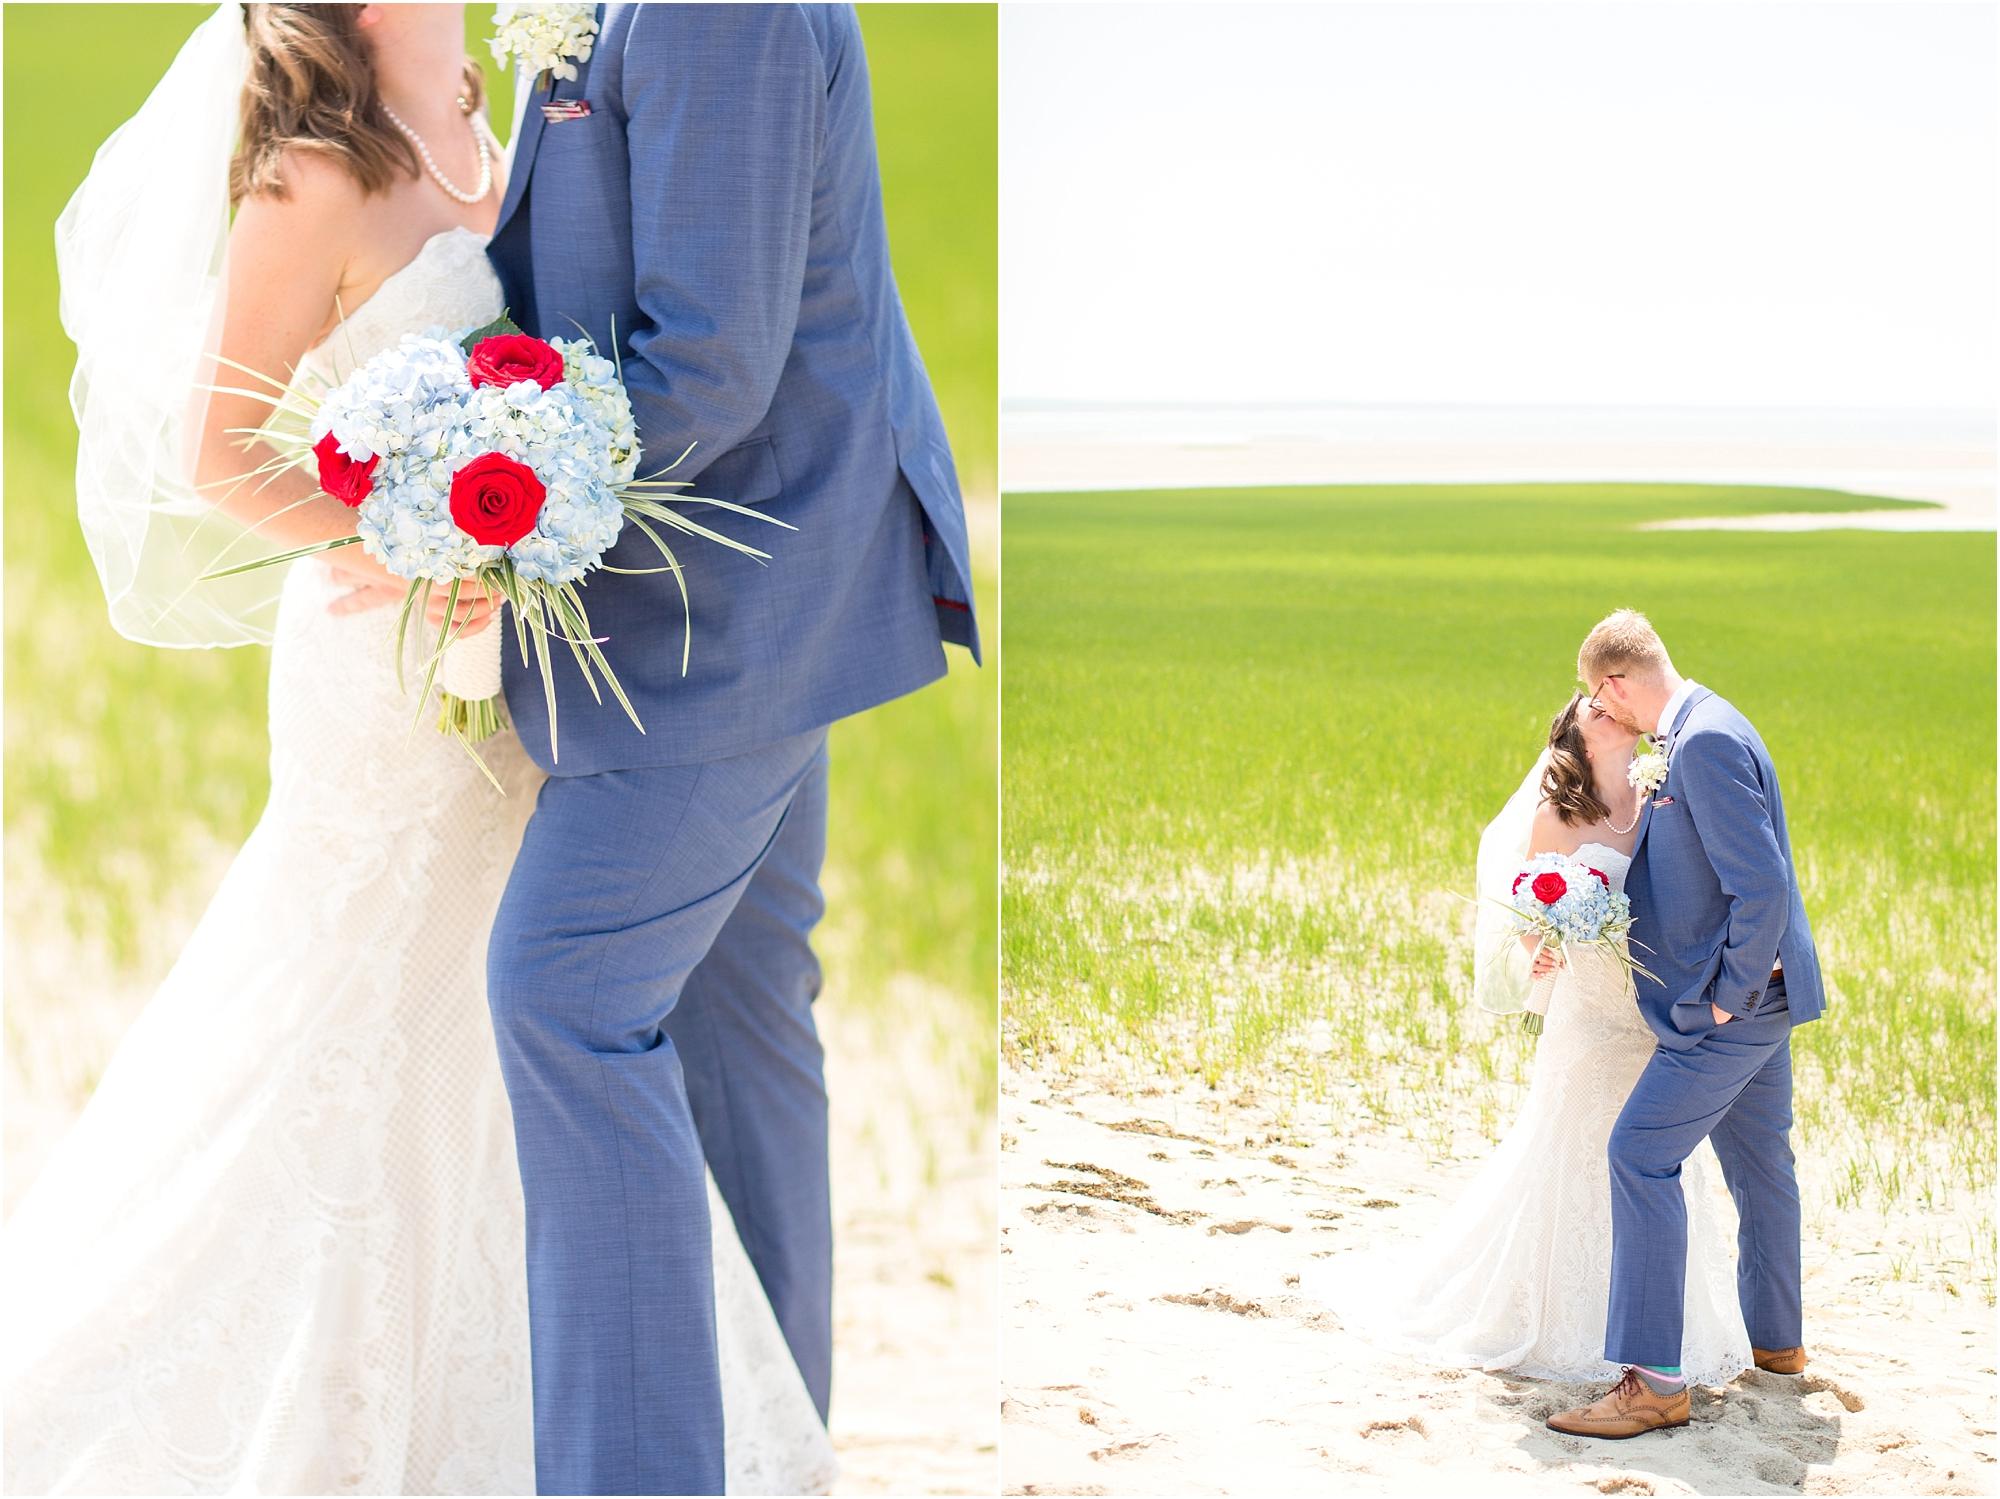 Goodman 3-Bride & Groom Portraits-222_anna grace photography wellfleet cape cod massachusetts destination wedding photographer Chequessett Yacht and Country Club wedding photo.jpg